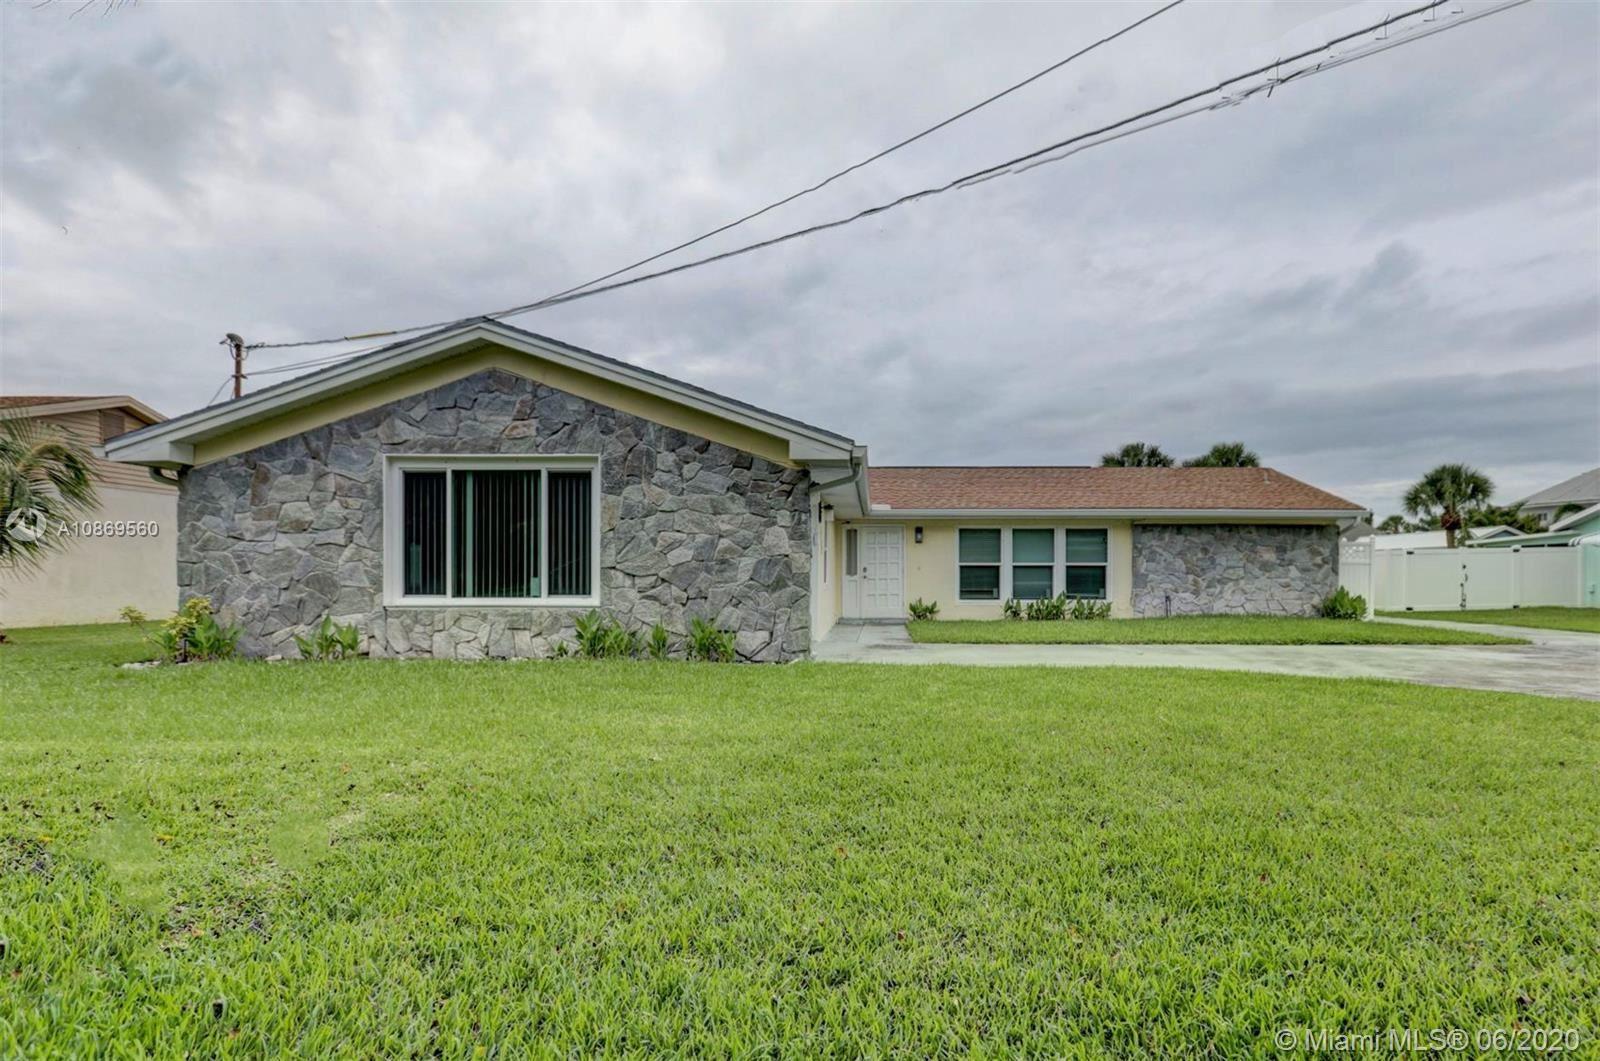 1912 Coconut Dr, Fort Pierce, FL 34949 - #: A10869560